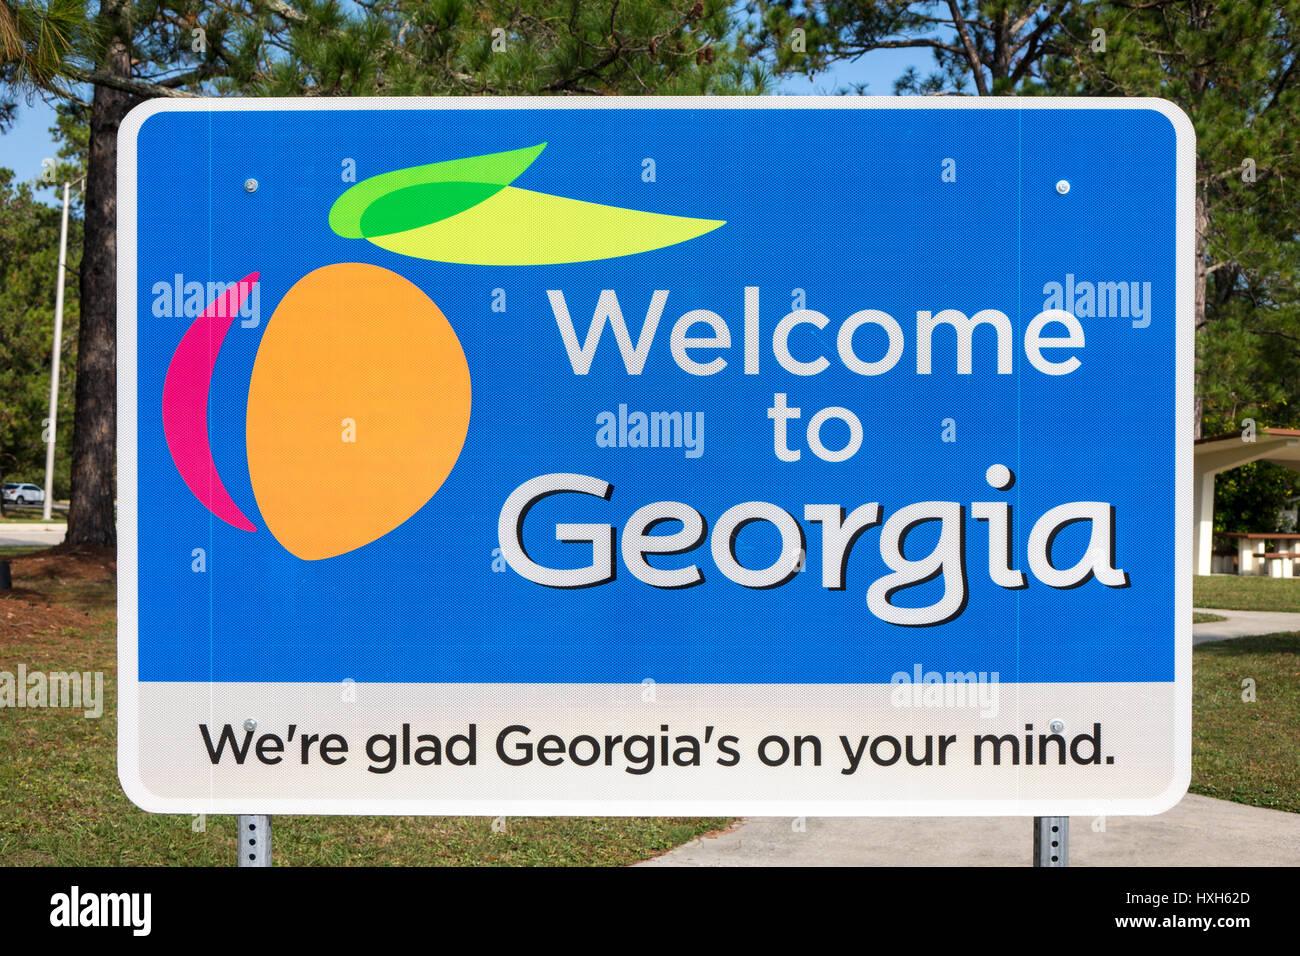 Georgia Welcome Sign Stock Photos & Georgia Welcome Sign Stock ...